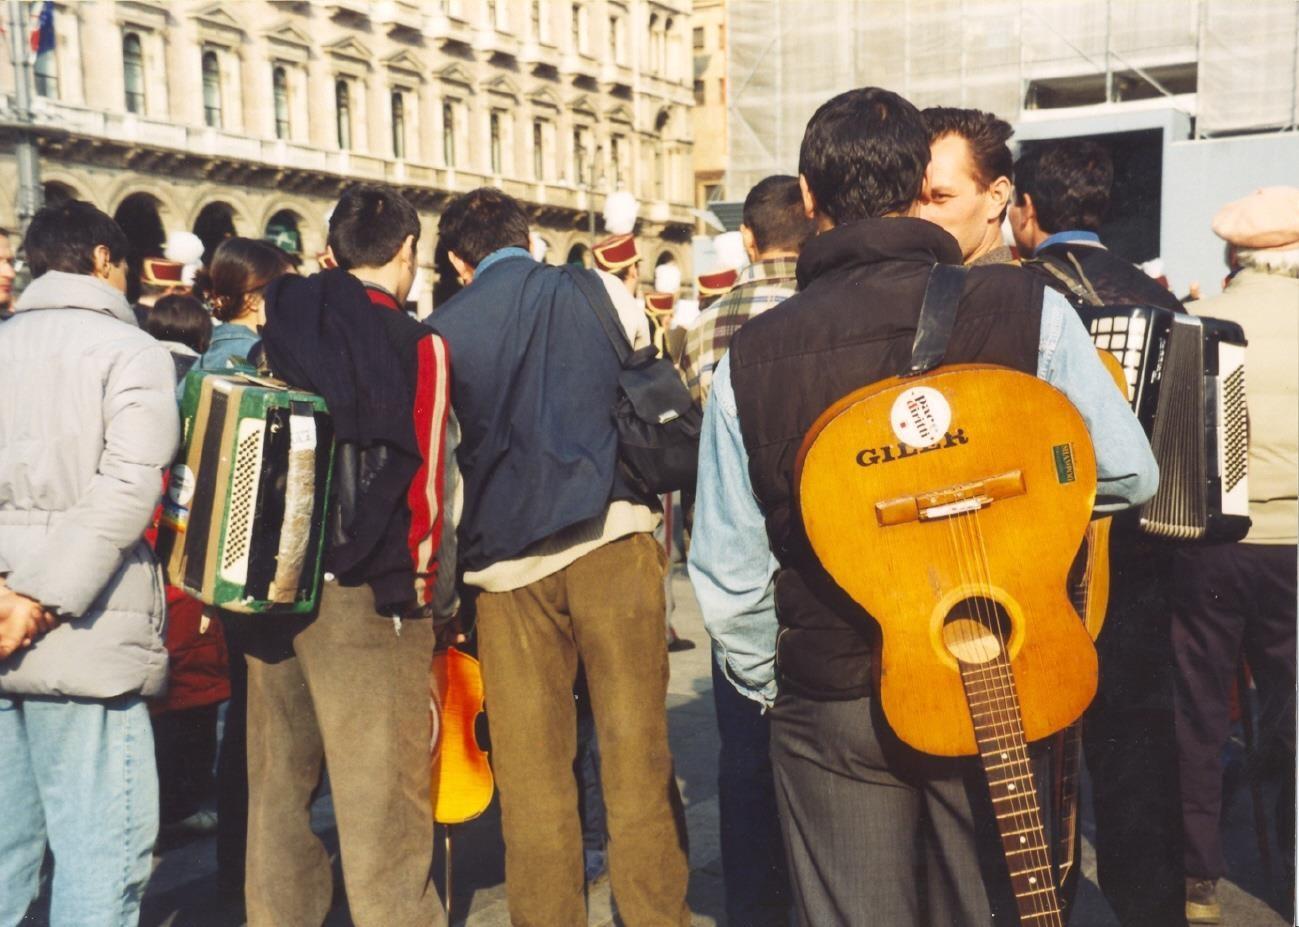 PIAZZA DUOMO MARZO 2003